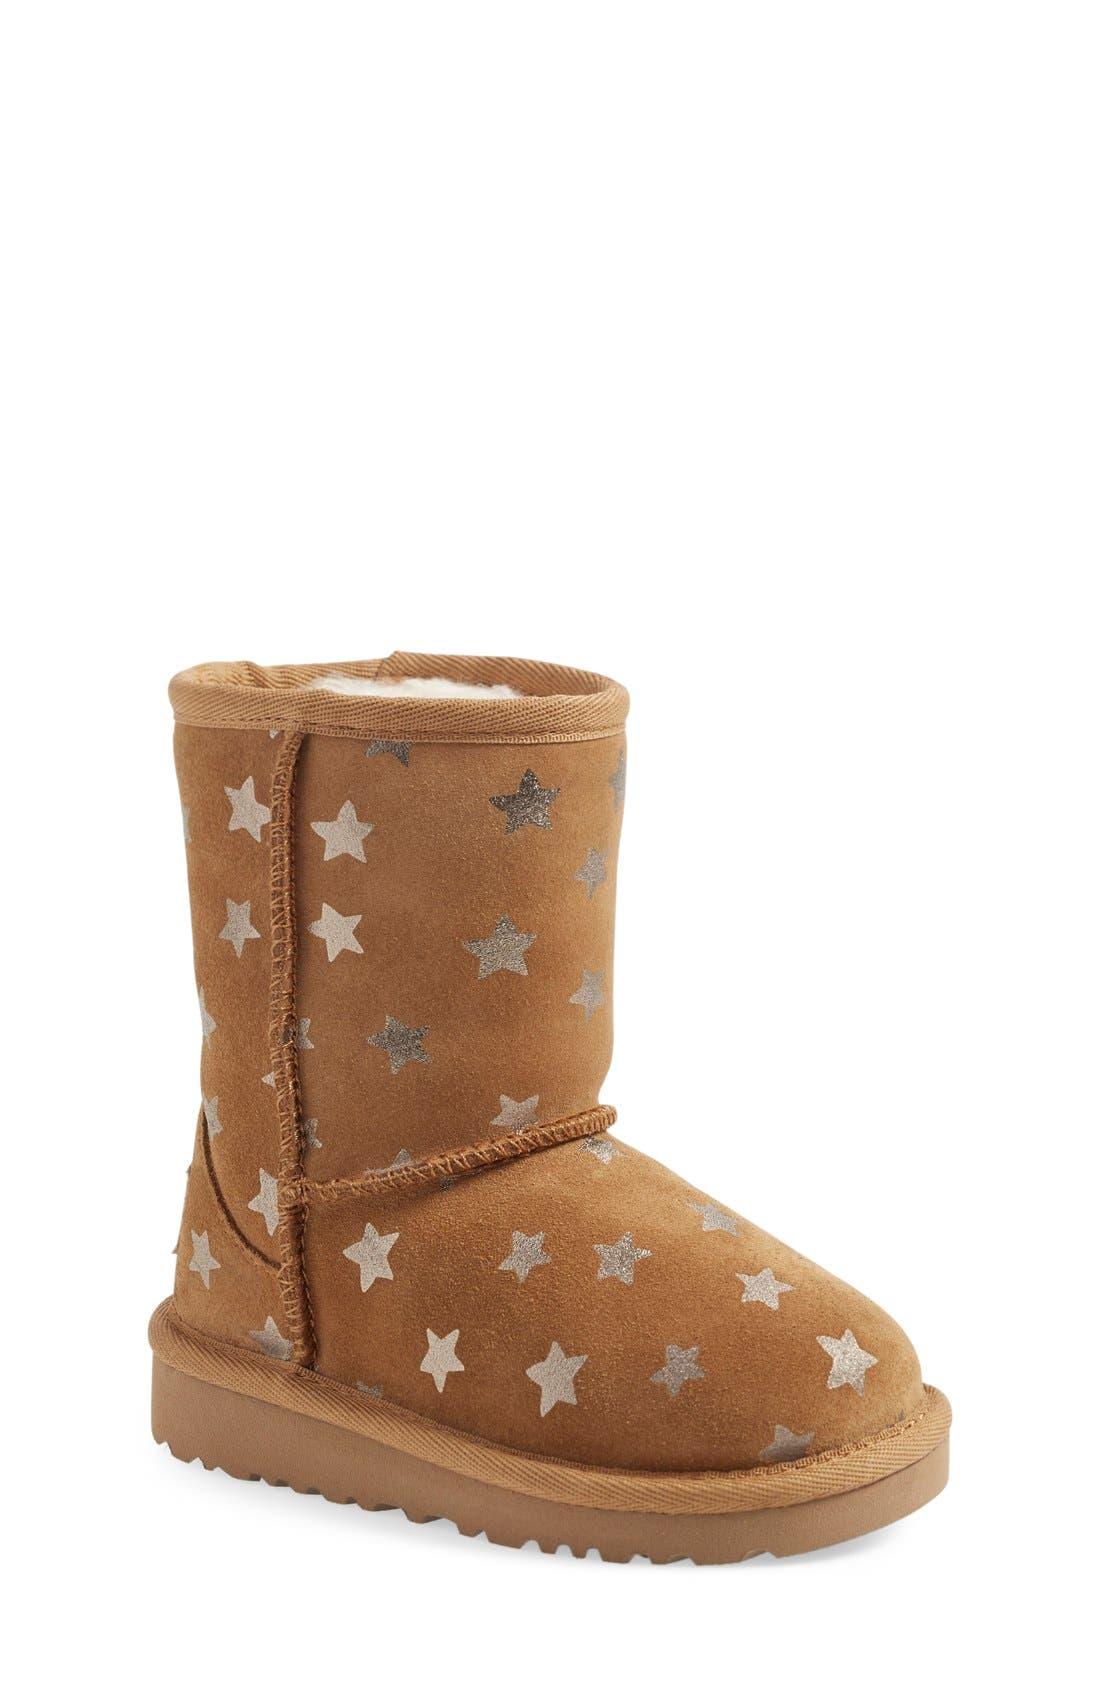 Main Image - UGG® Classic - Stars Short Boot (Walker) (Nordstrom Exclusive)